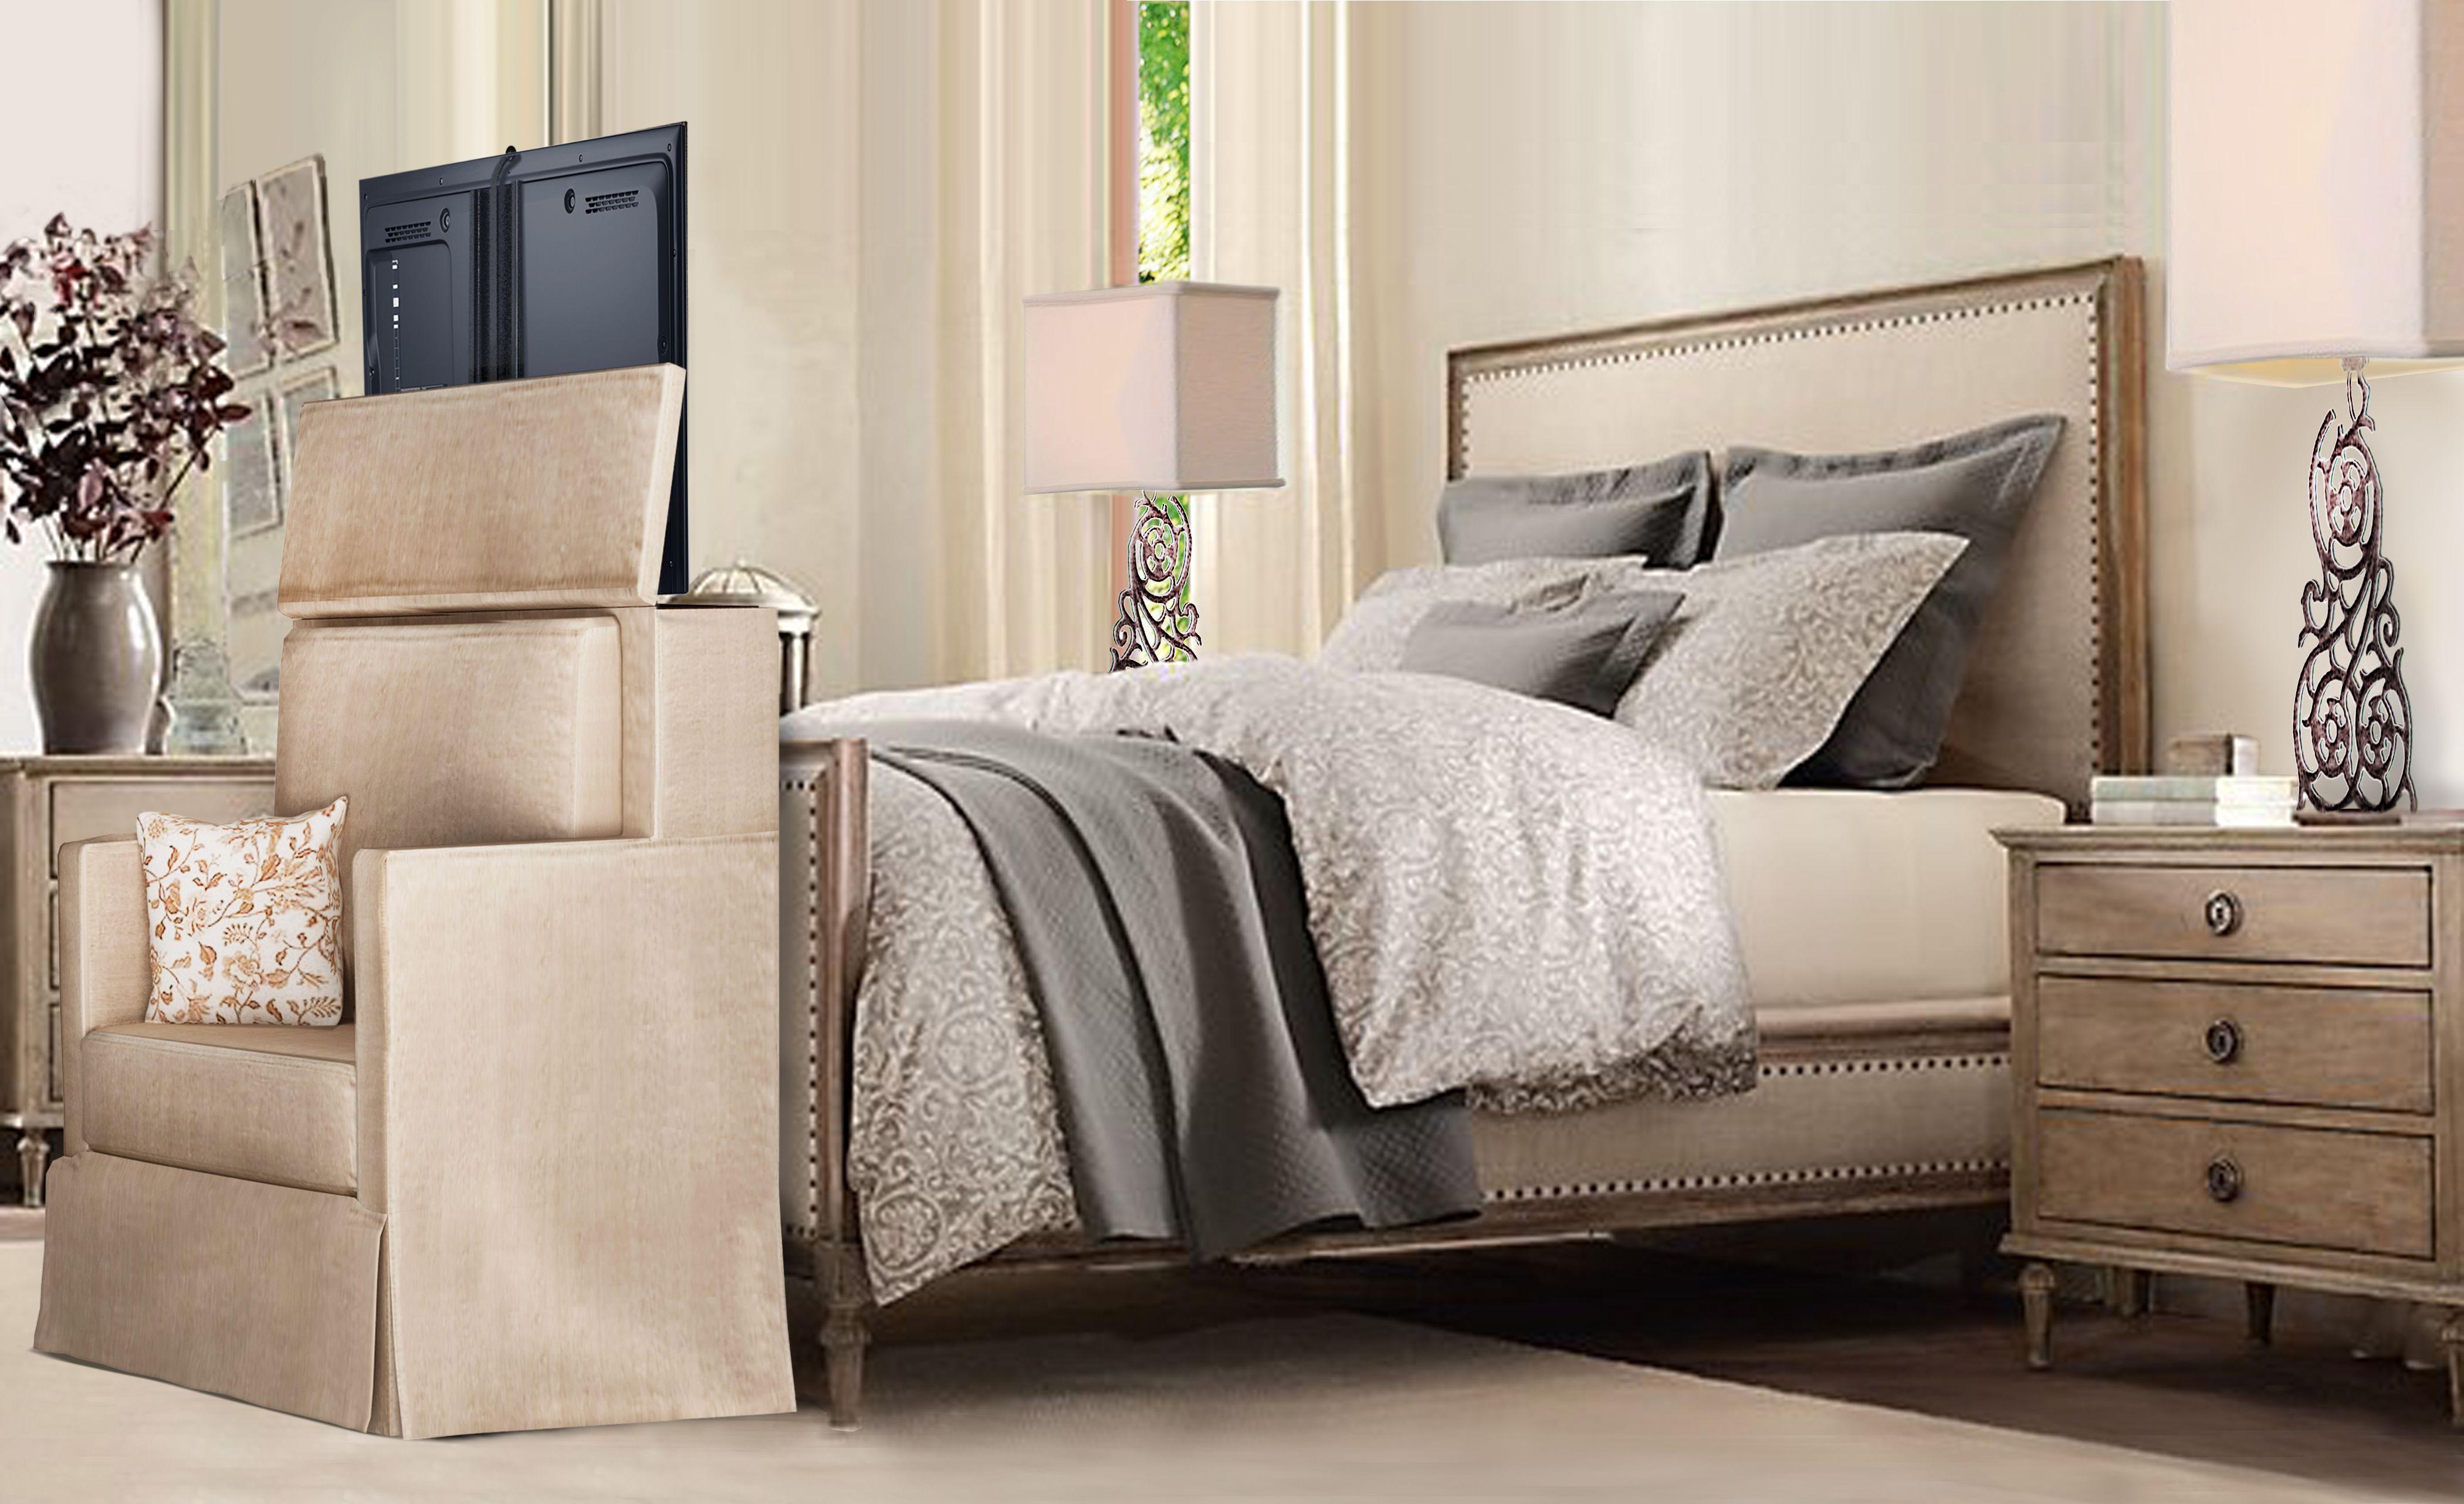 Tv In The Back Of A Settee 2499 00 Home Bedroom Tv In Bedroom